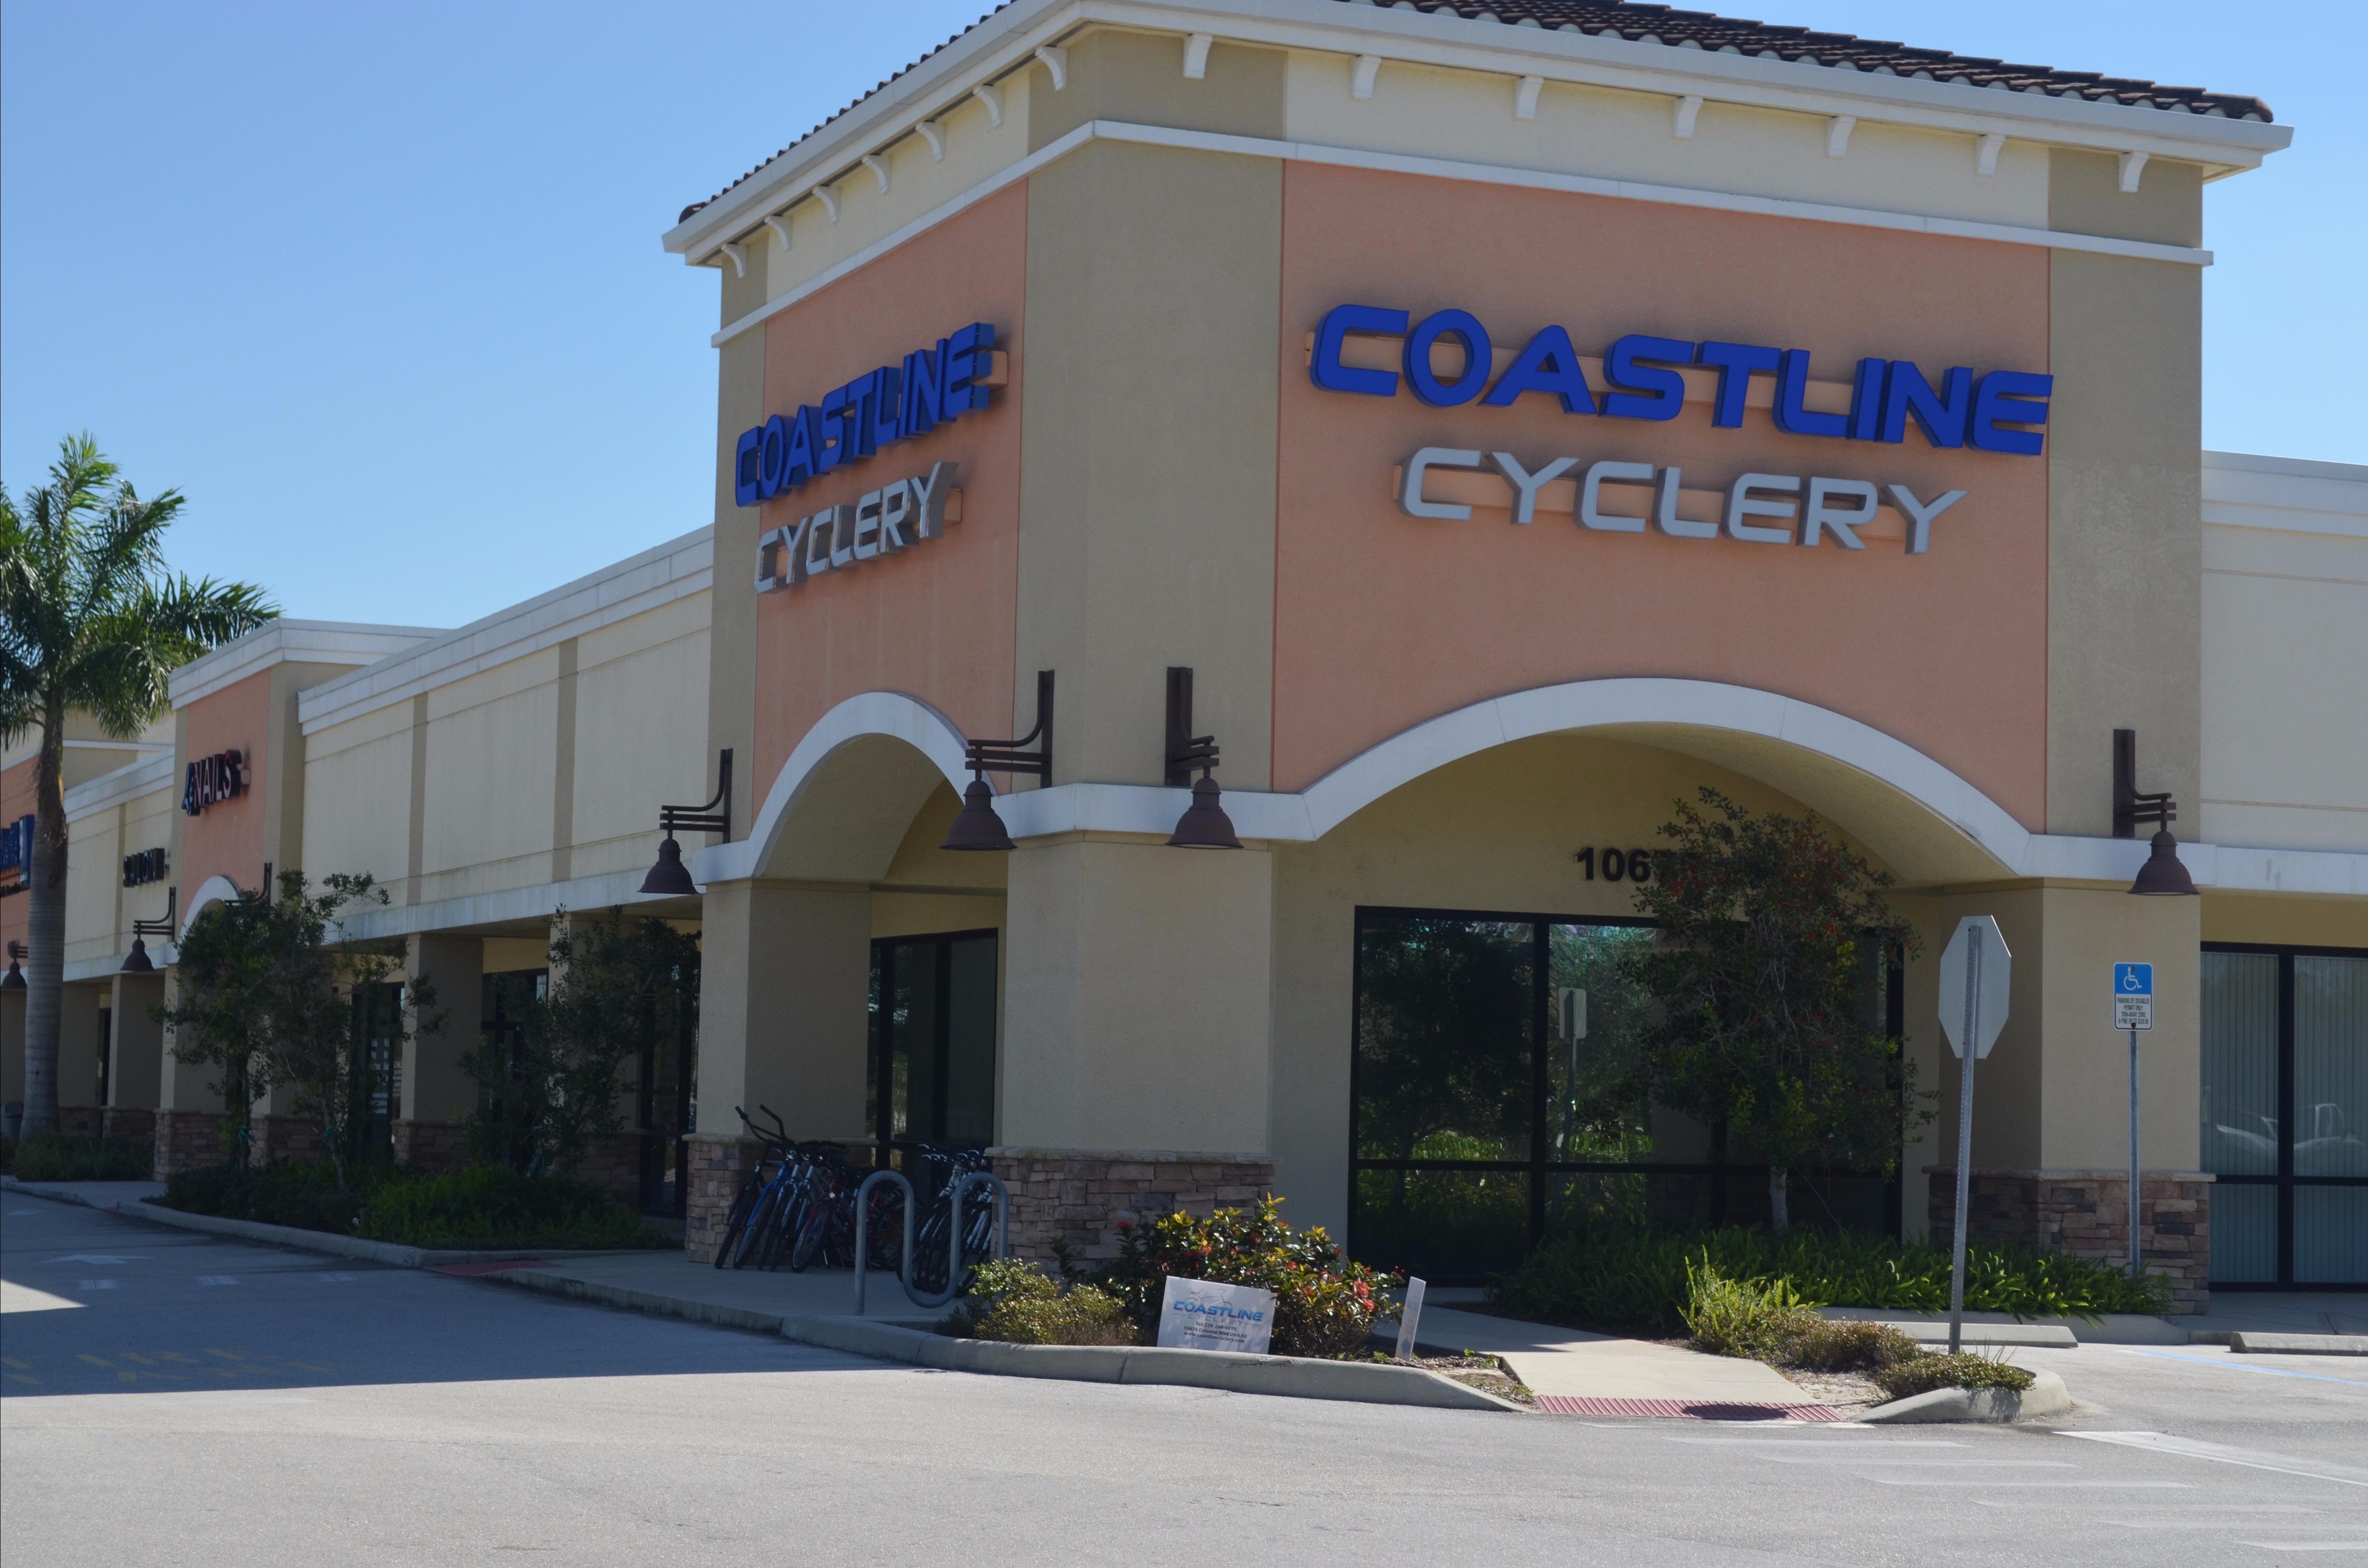 Coastline Cyclery image 0